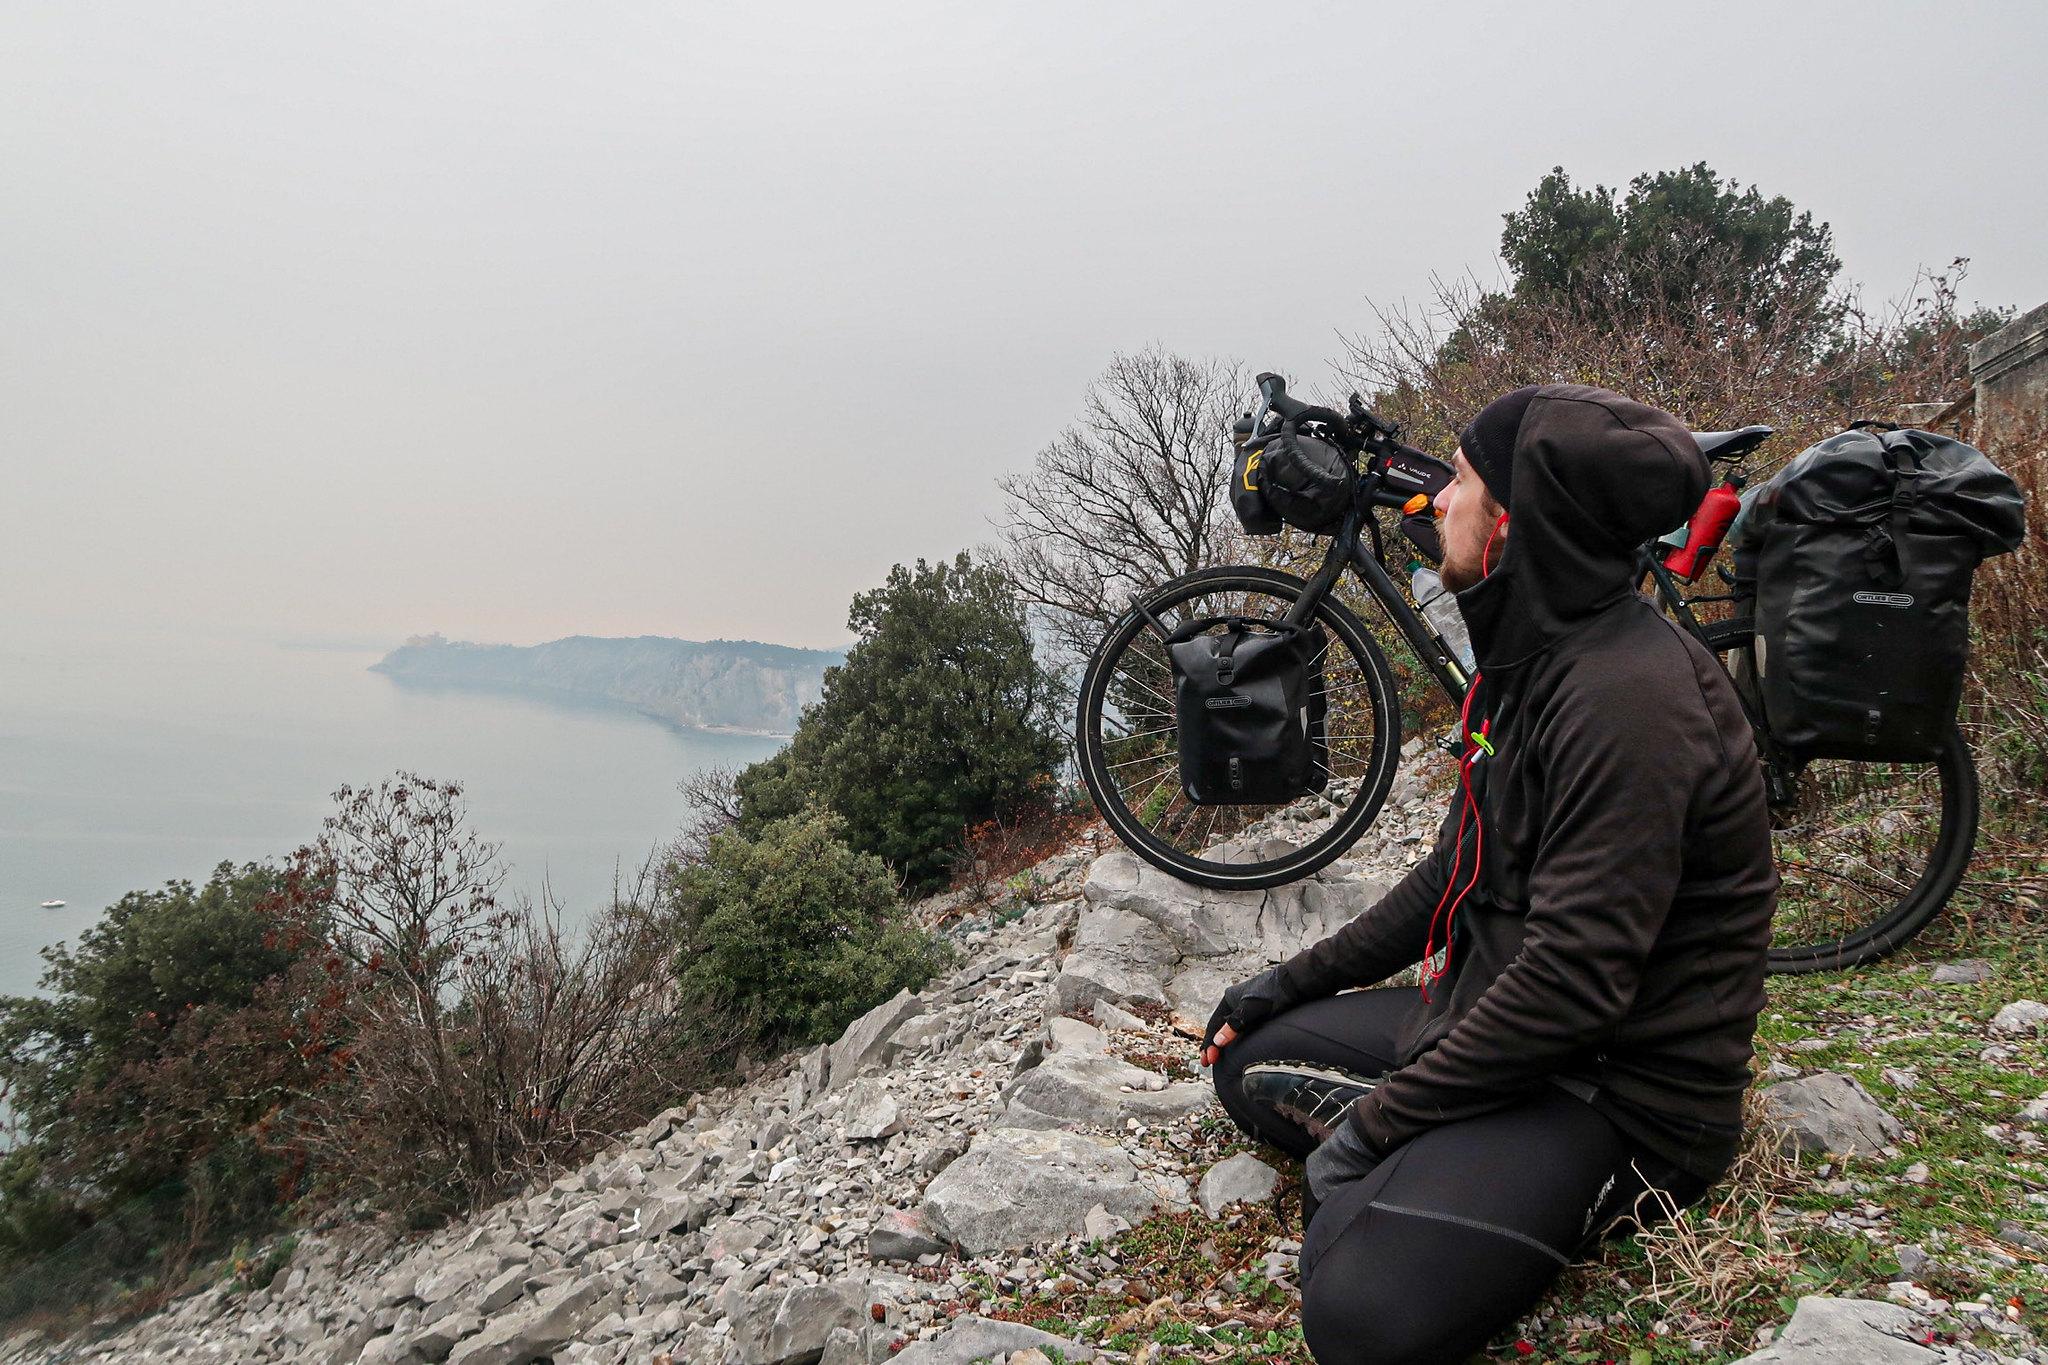 Reaching the Adriatic Sea